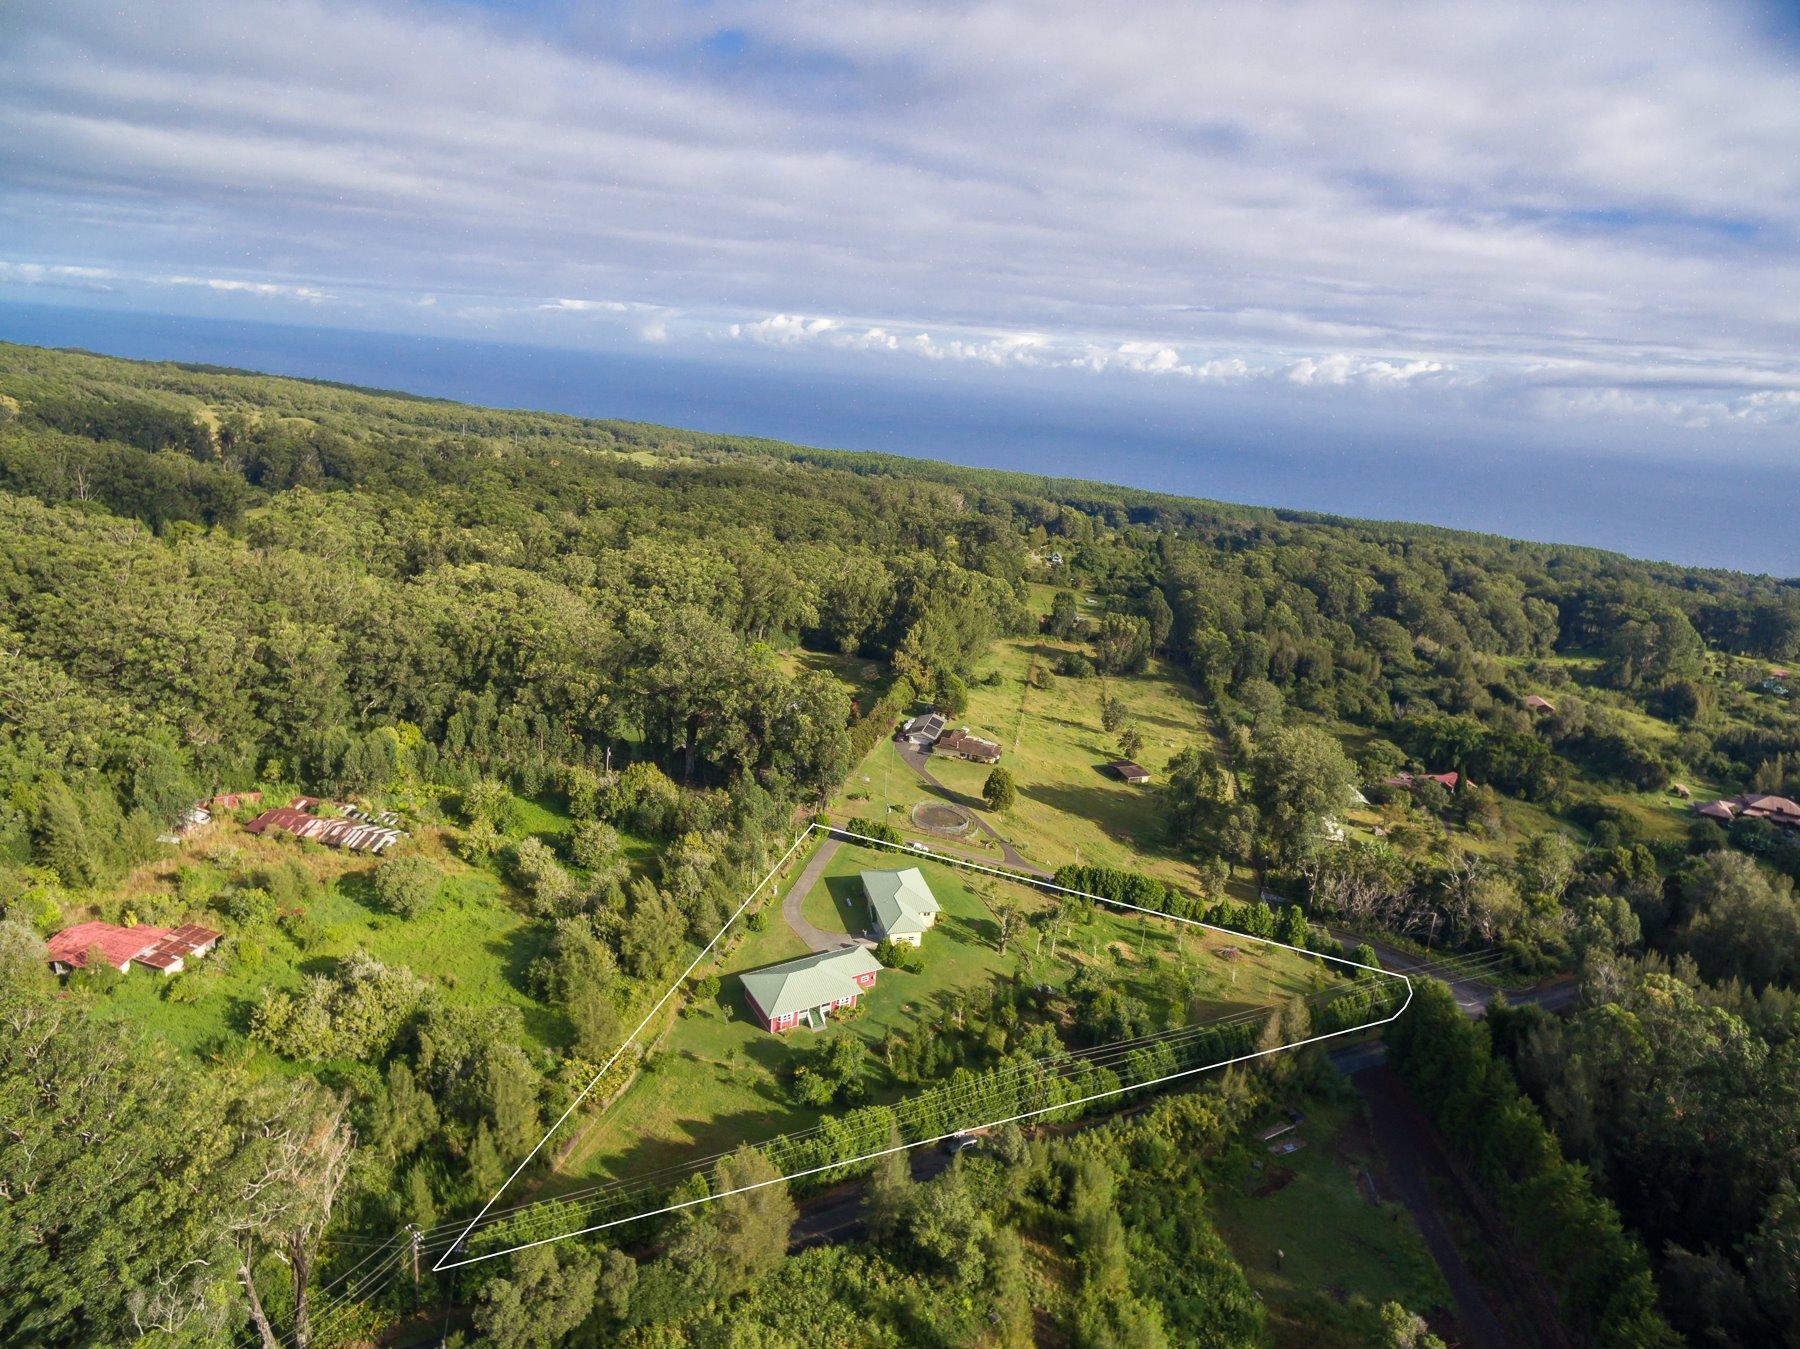 This area has multiple Farmers' Markets a week, 2 award winning college preparatory schools, Hawaiian Immersion Charter Schools, Kamehameha Pre-School, well-established home school communities and North Hawaii Community Hospital